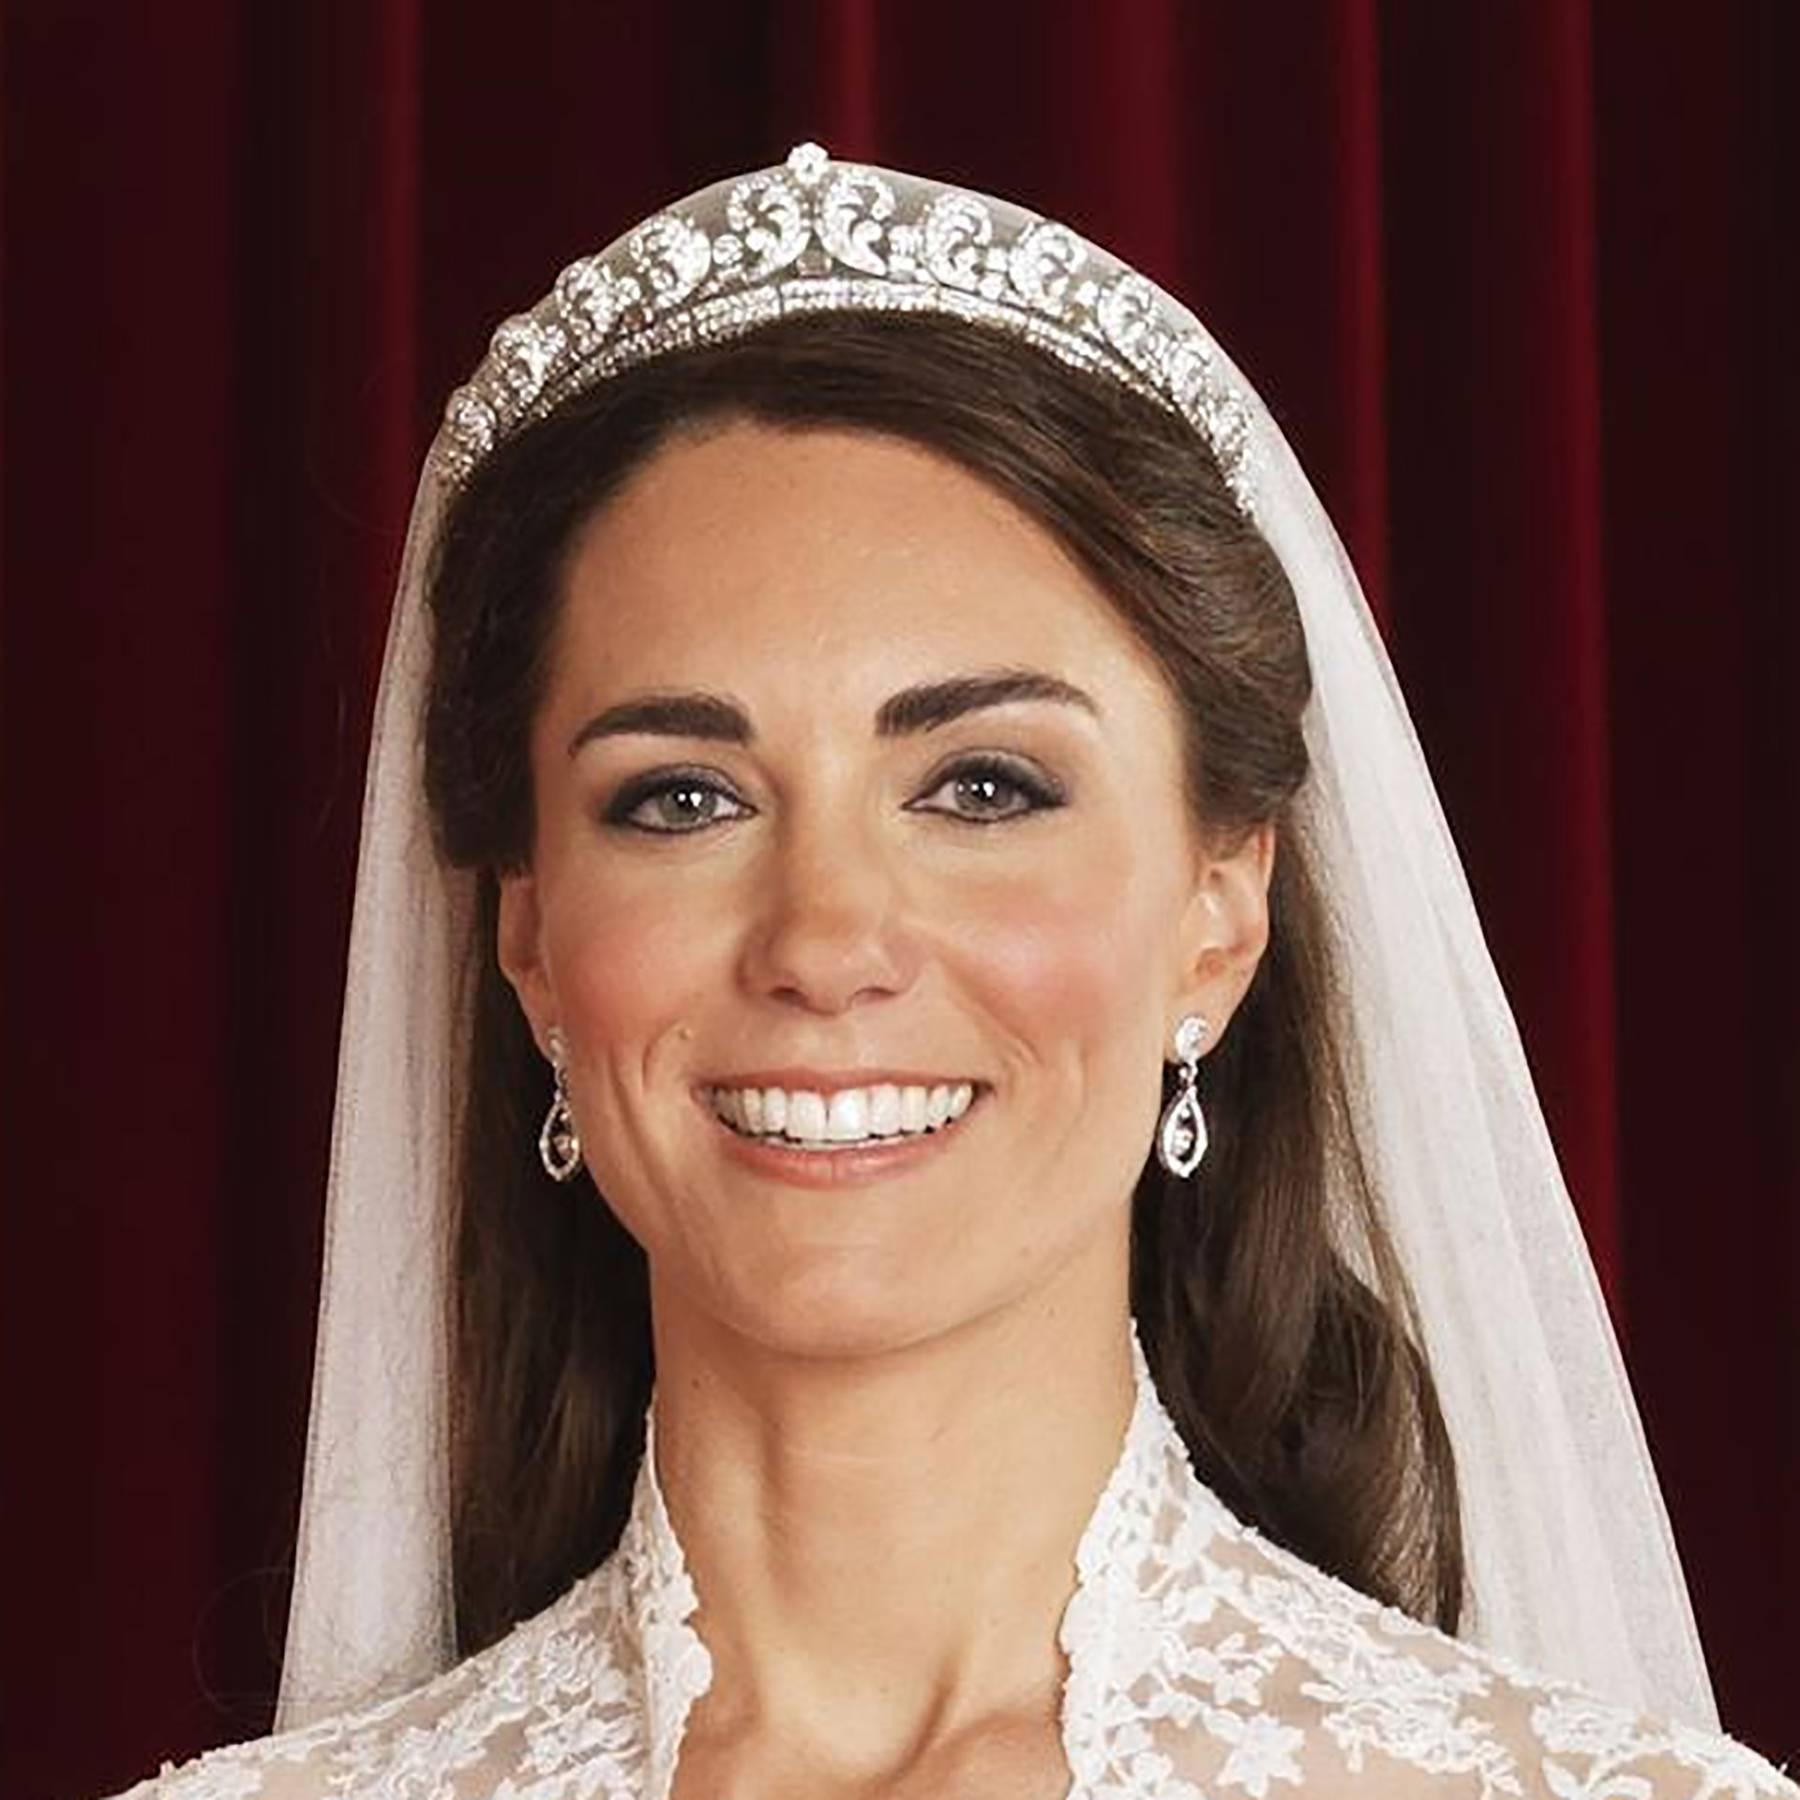 The Story Of Kate Middleton S Wedding Tiara The Cartier Halo Tatler